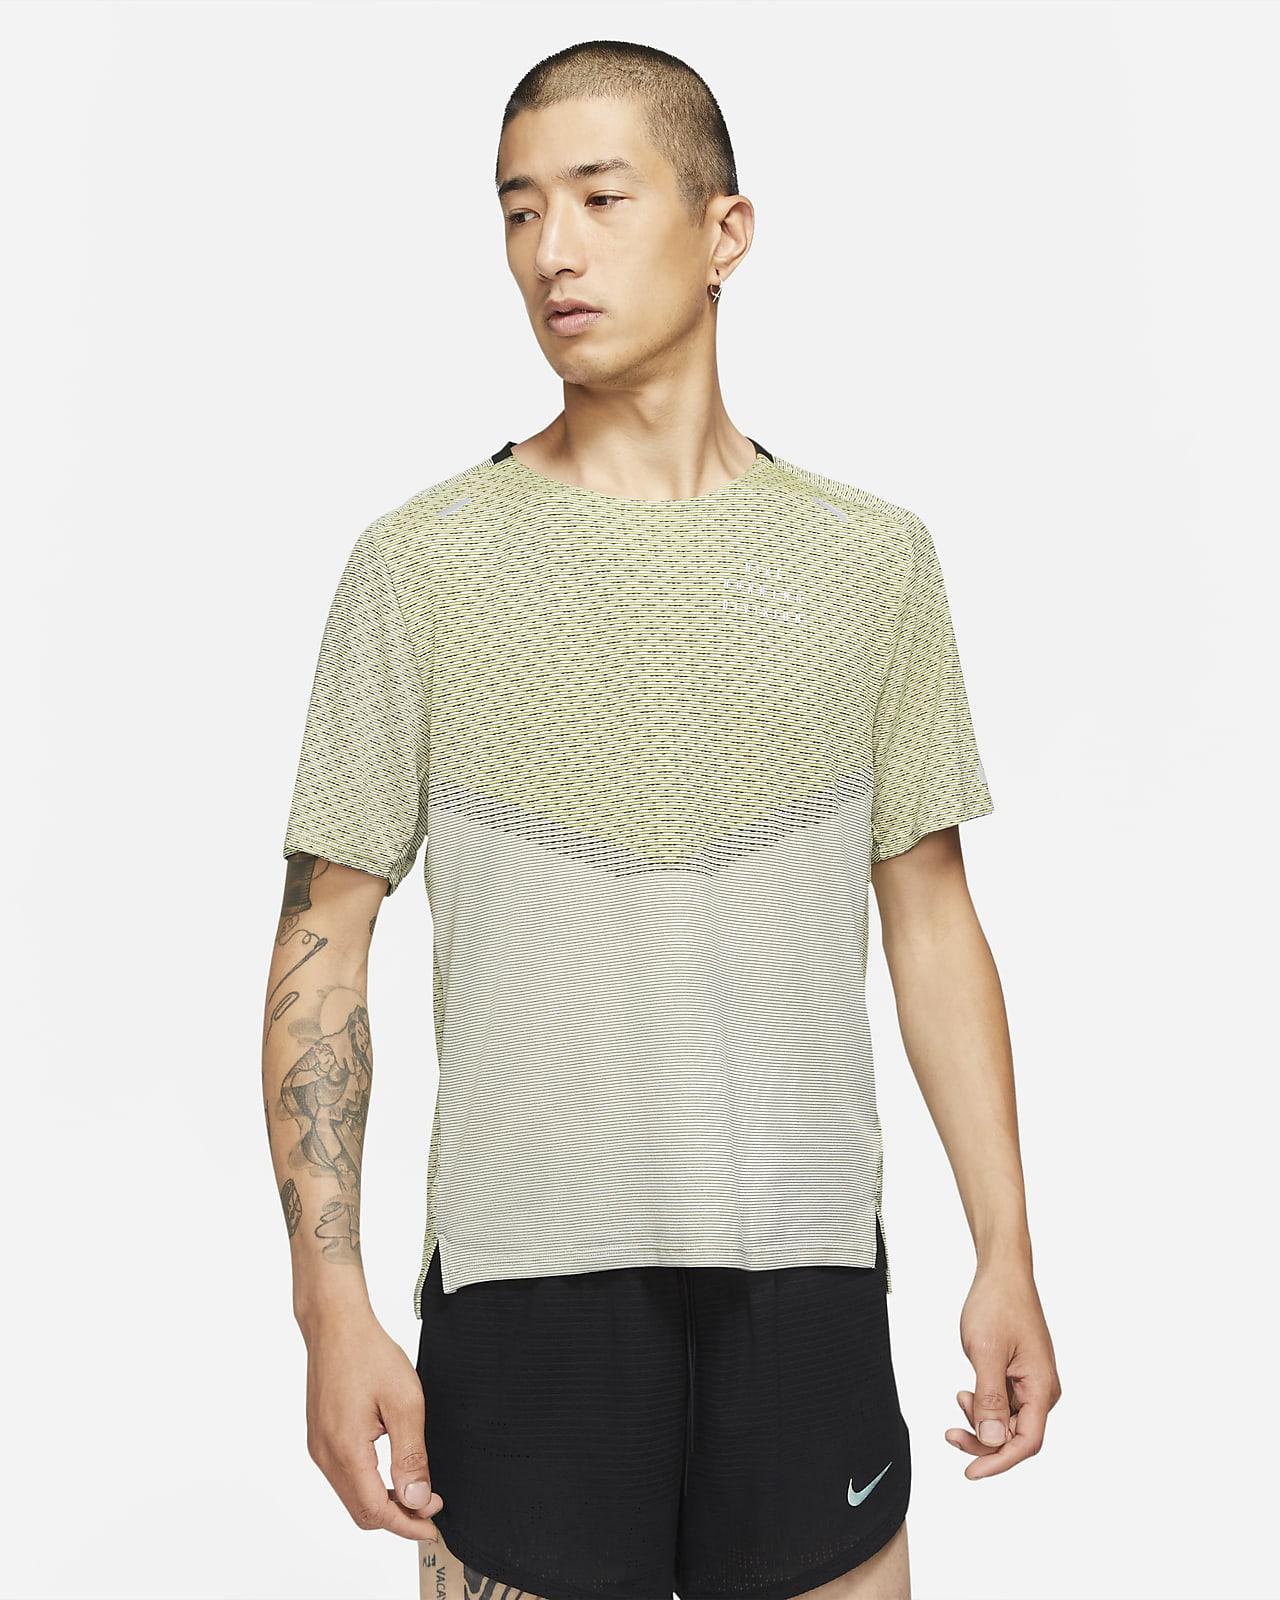 Nike Dri-FIT ADV Run Division Techknit 男款短袖上衣